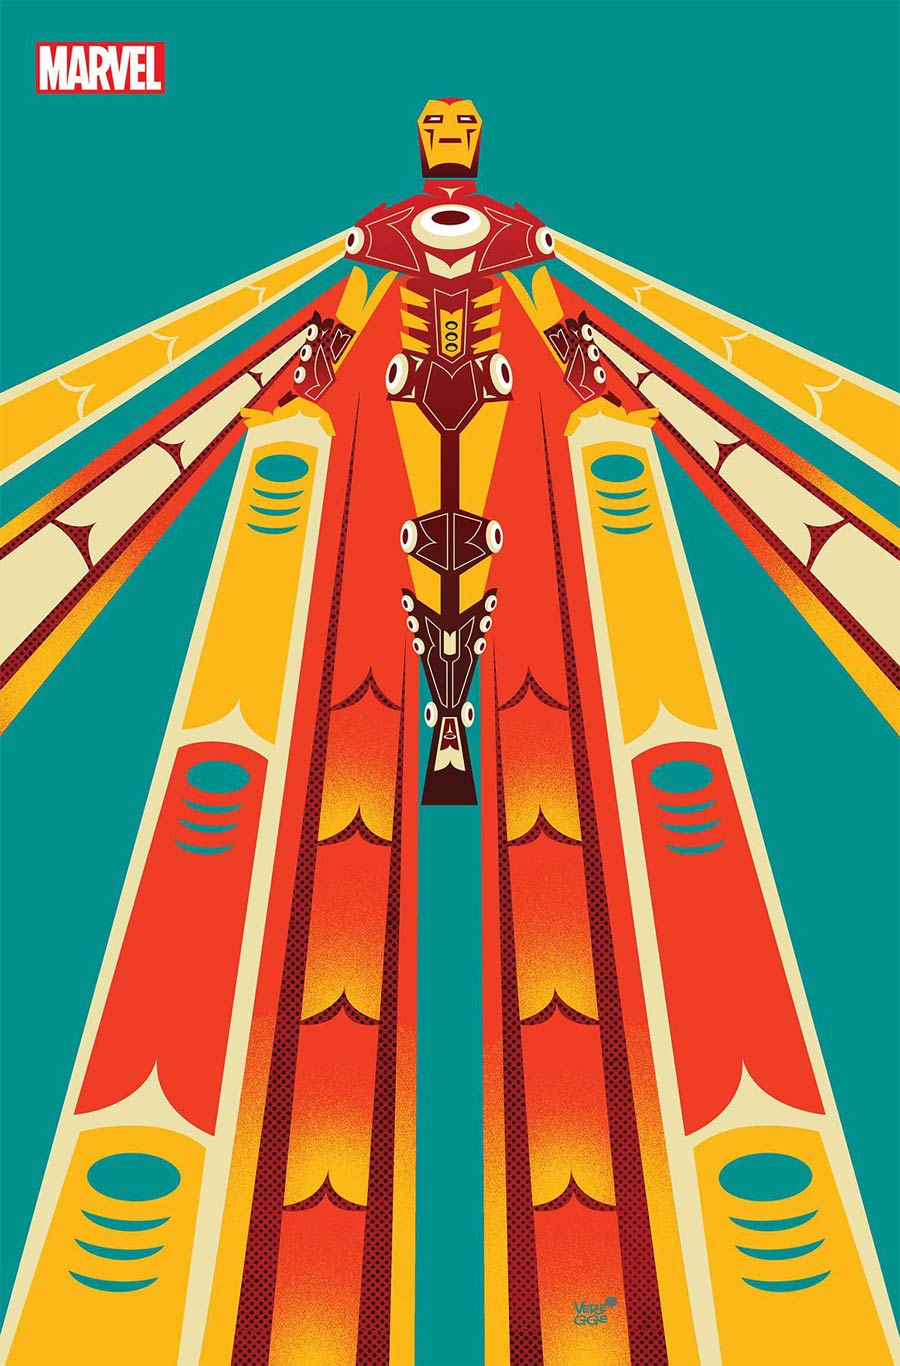 Iron Man Vol 6 #3 Cover B Variant Jeffrey Veregge Native American Heritage Tribute Iron Man Cover